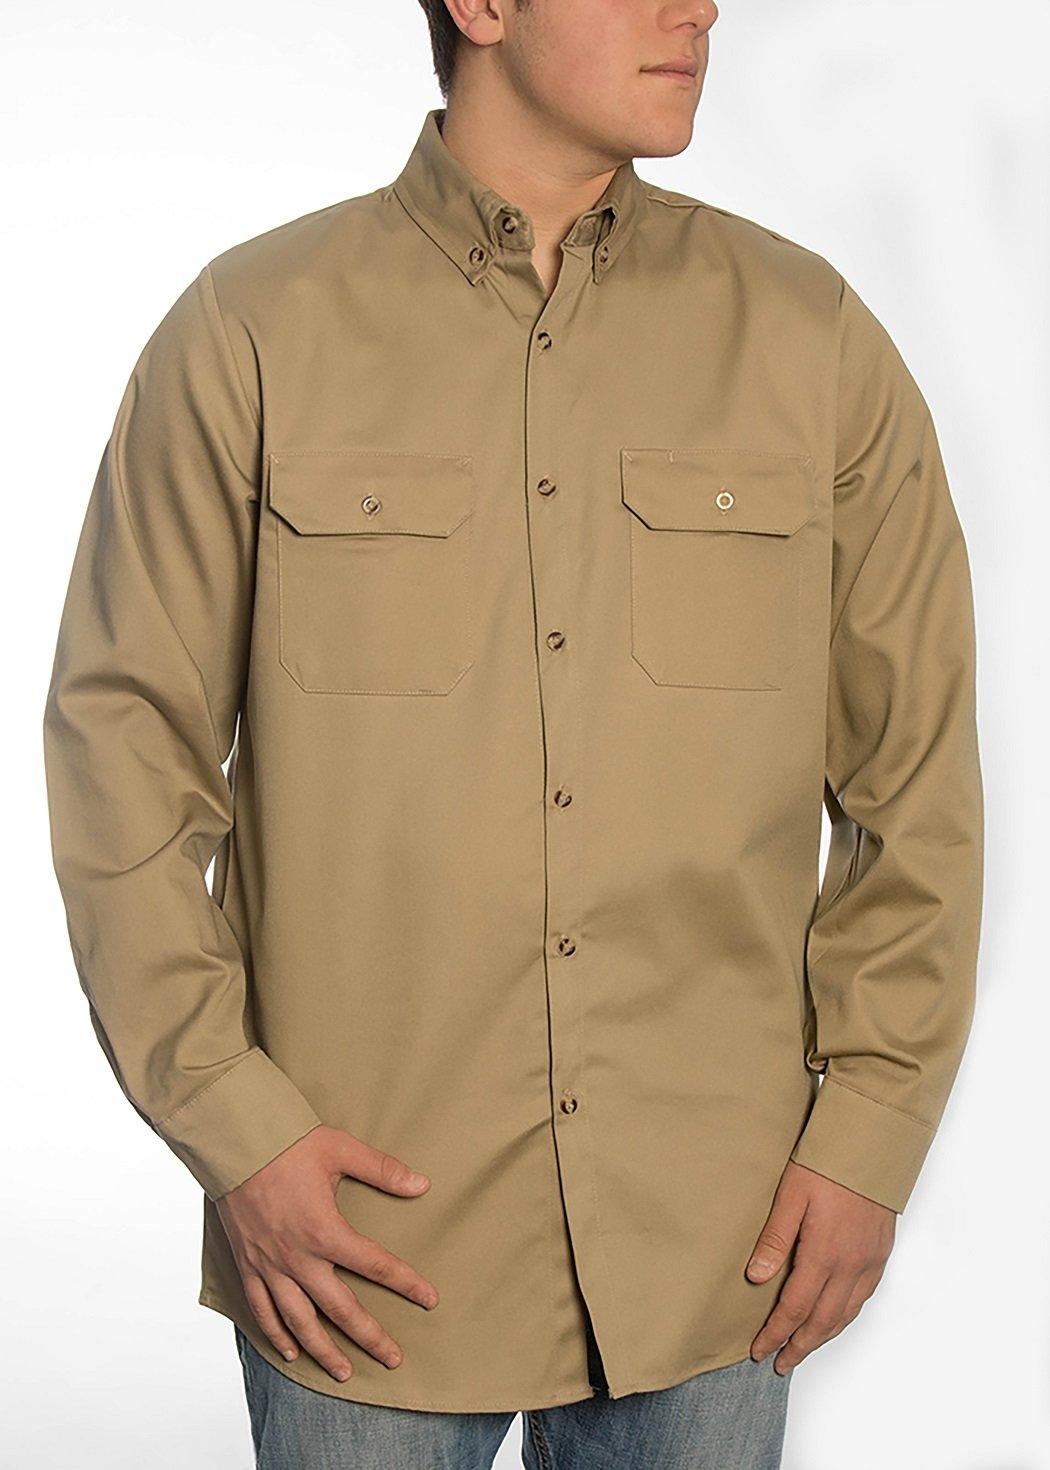 95962005eeb3 Top 10 wholesale Khaki Work Shirt - Chinabrands.com